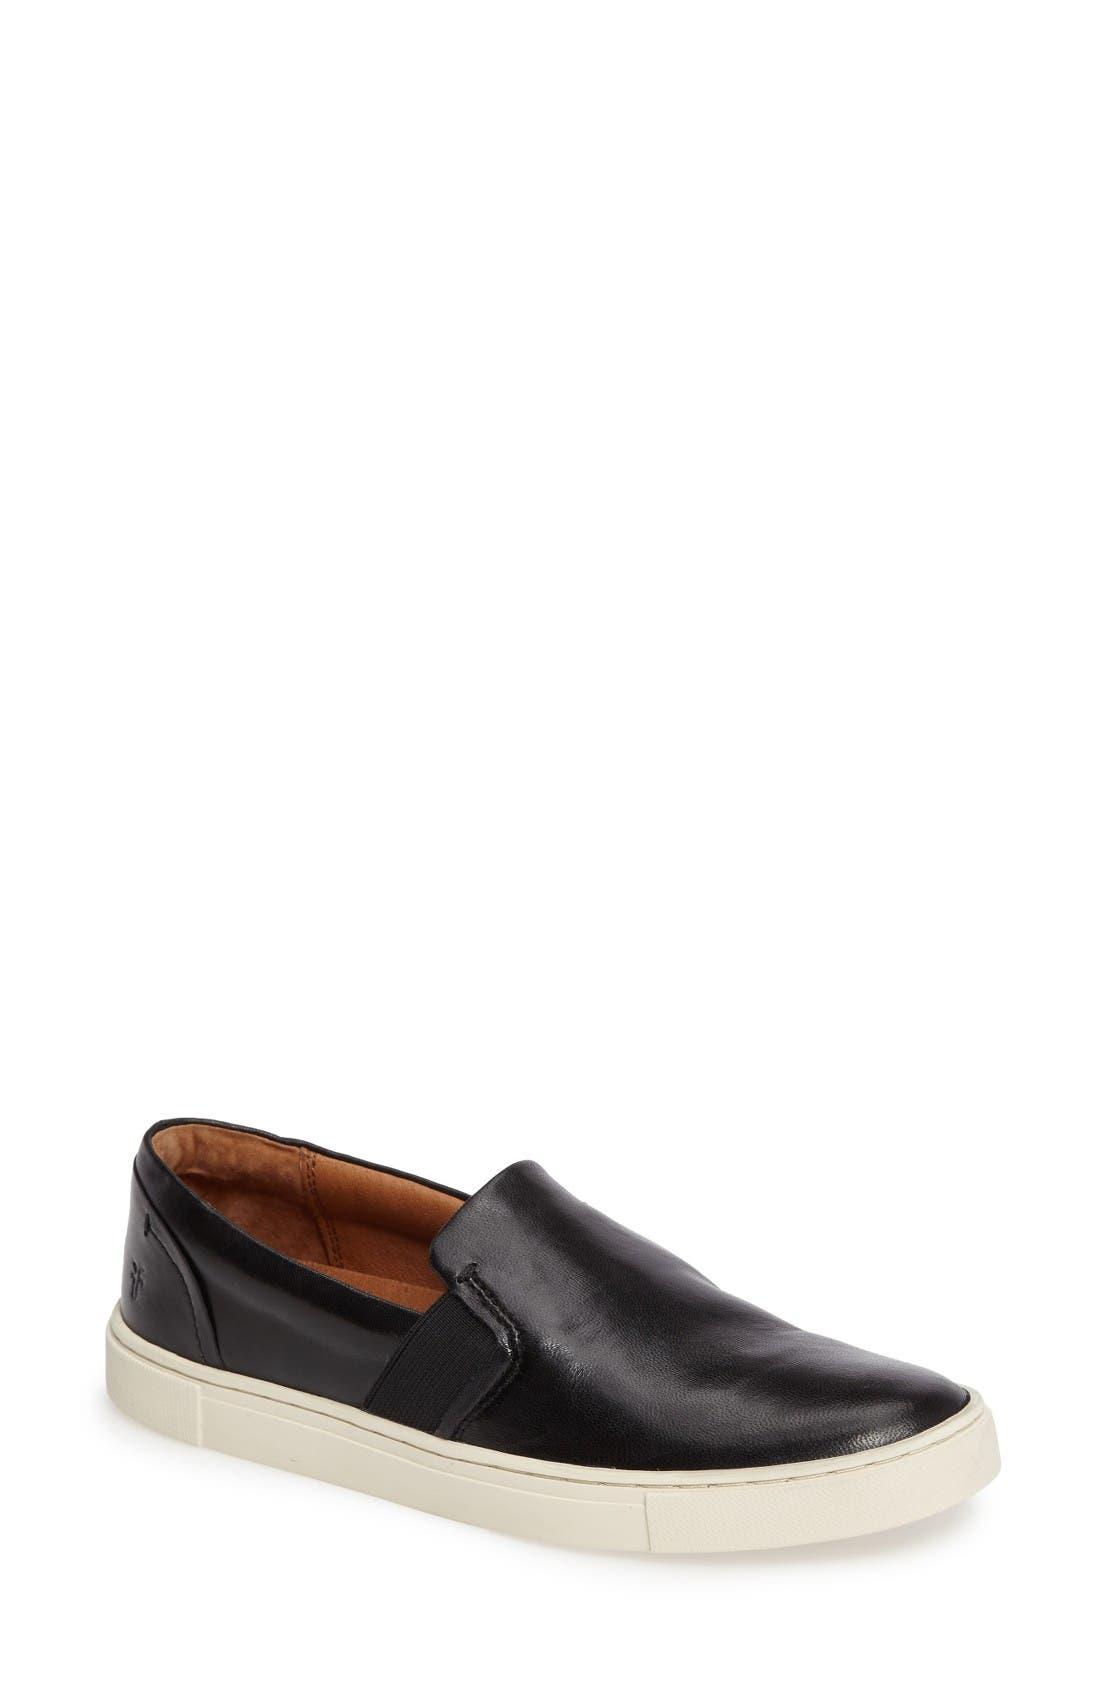 Ivy Slip-On Sneaker,                             Main thumbnail 1, color,                             Black